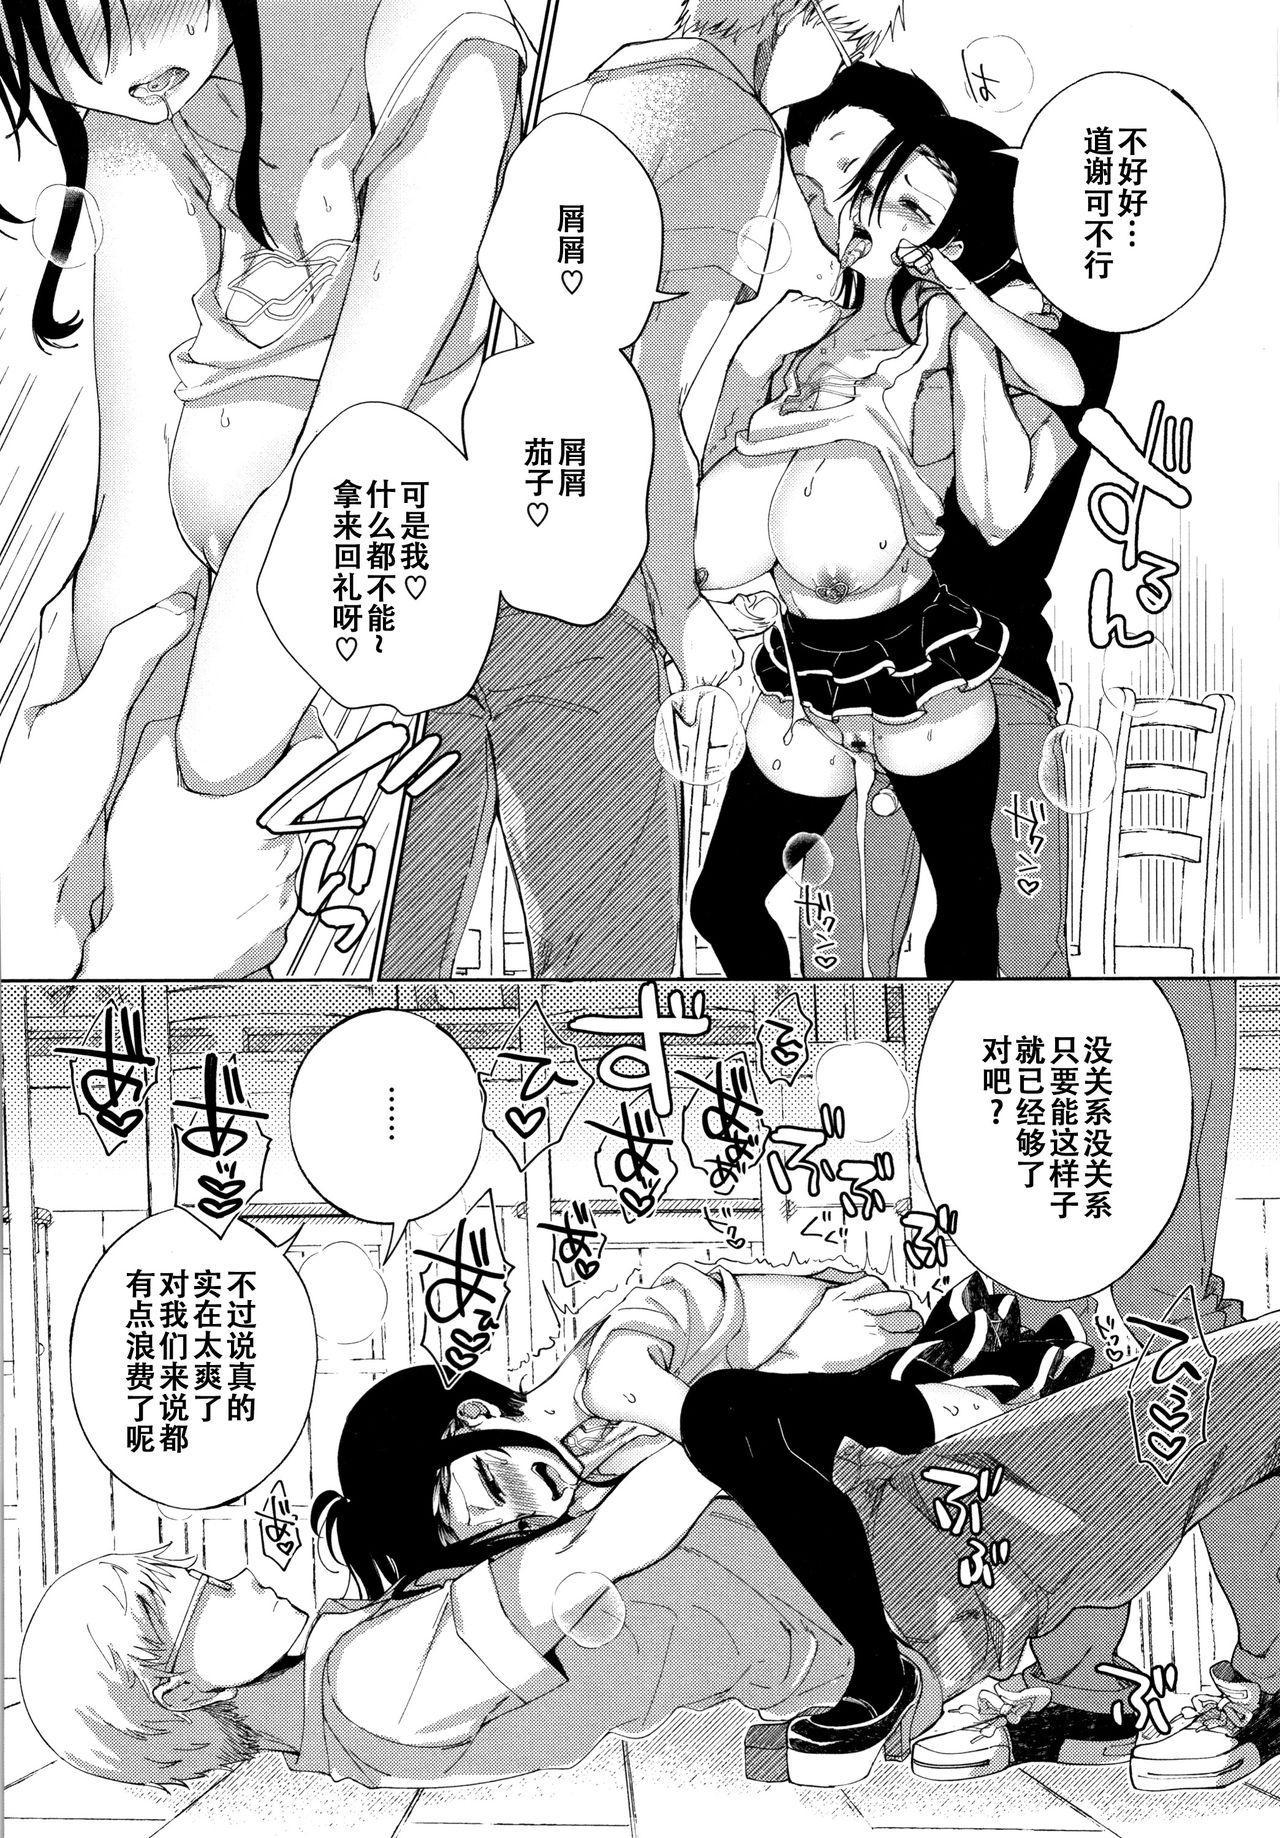 [Achumuchi] Saijaku Gal wa Ikizurai! - The weakest pussy is hard to go.ch.1-3 [Chinese] [战栗的玻璃棒汉化] [Ongoing] 44